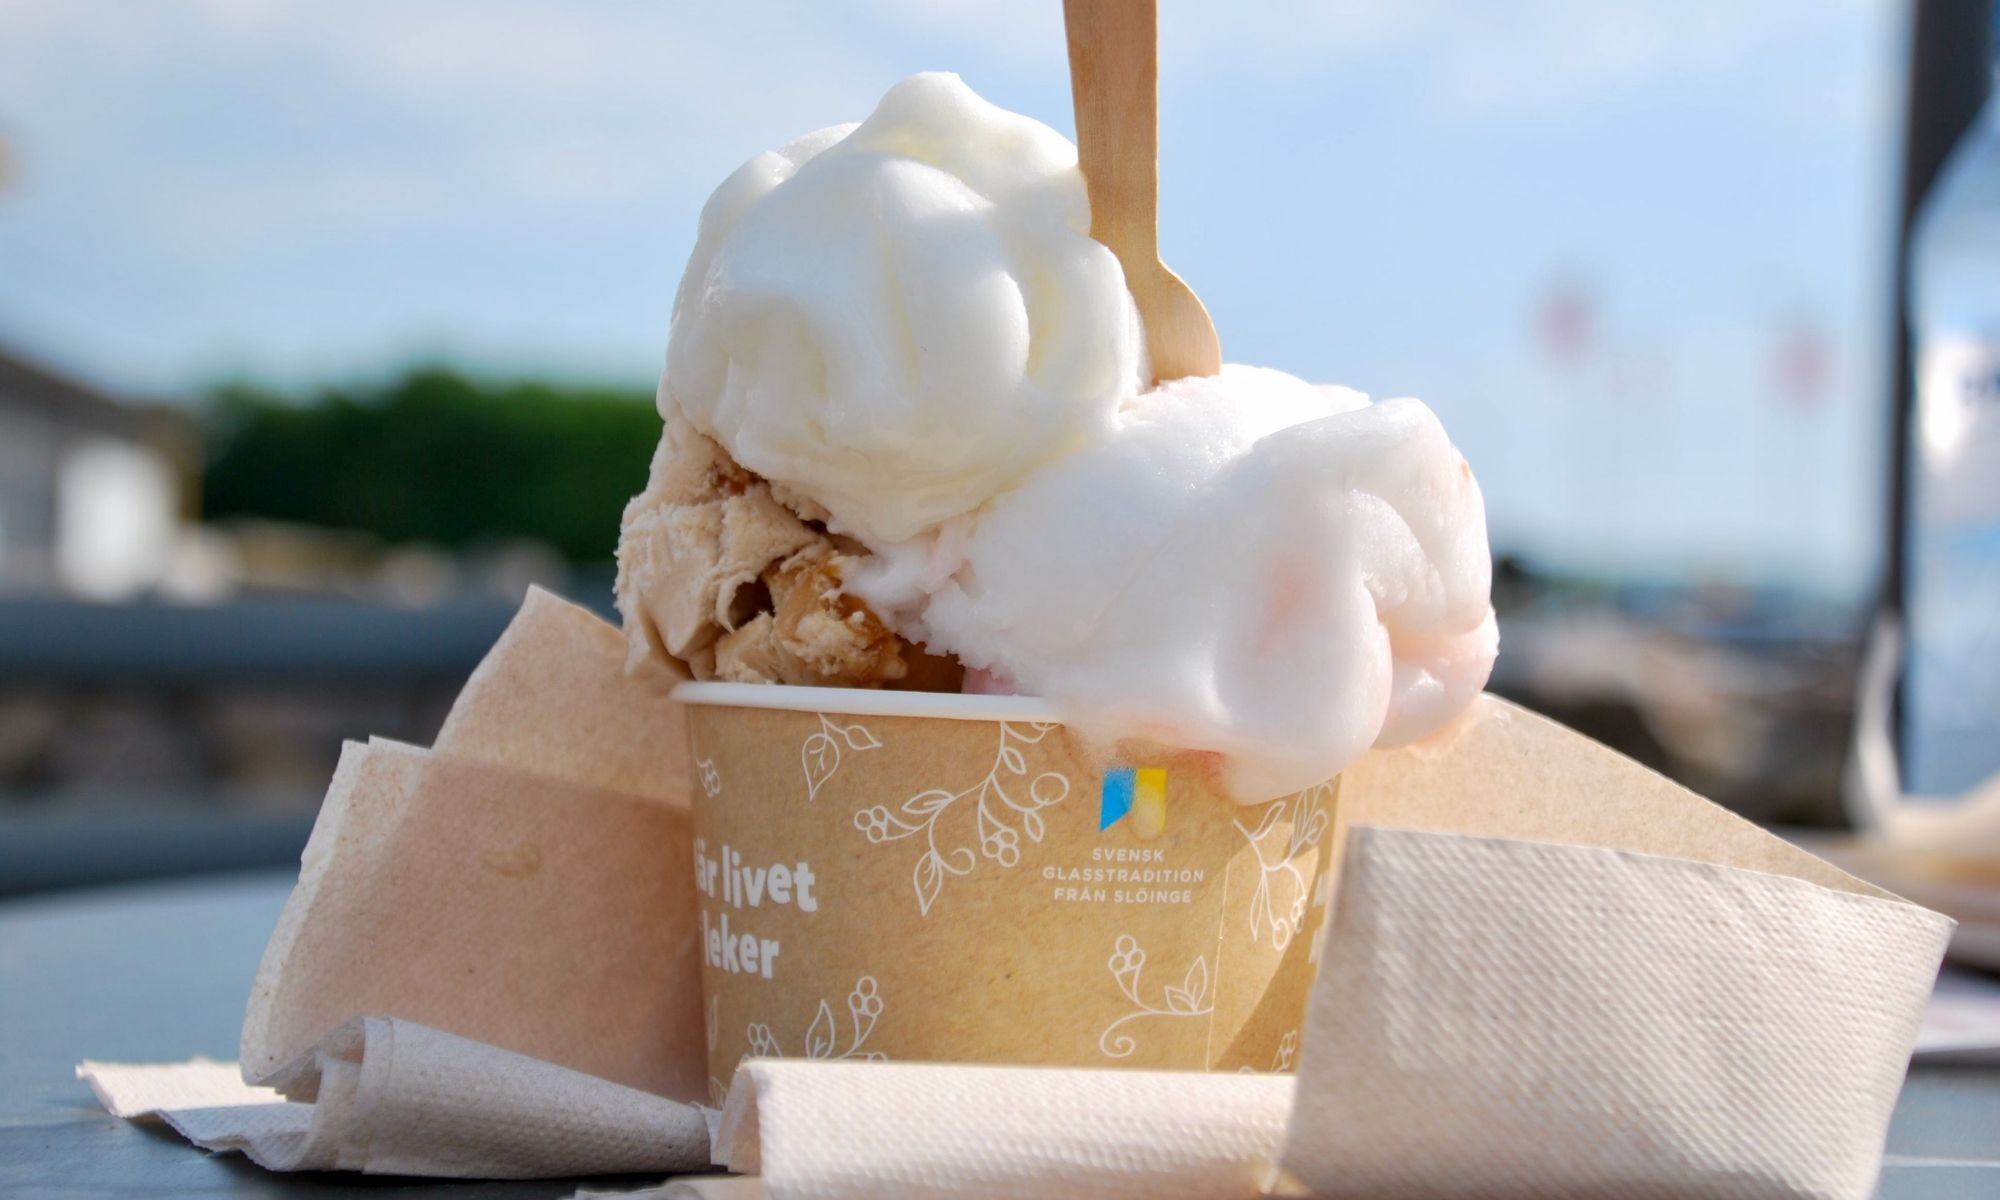 sia glass i slöinge falkenberg